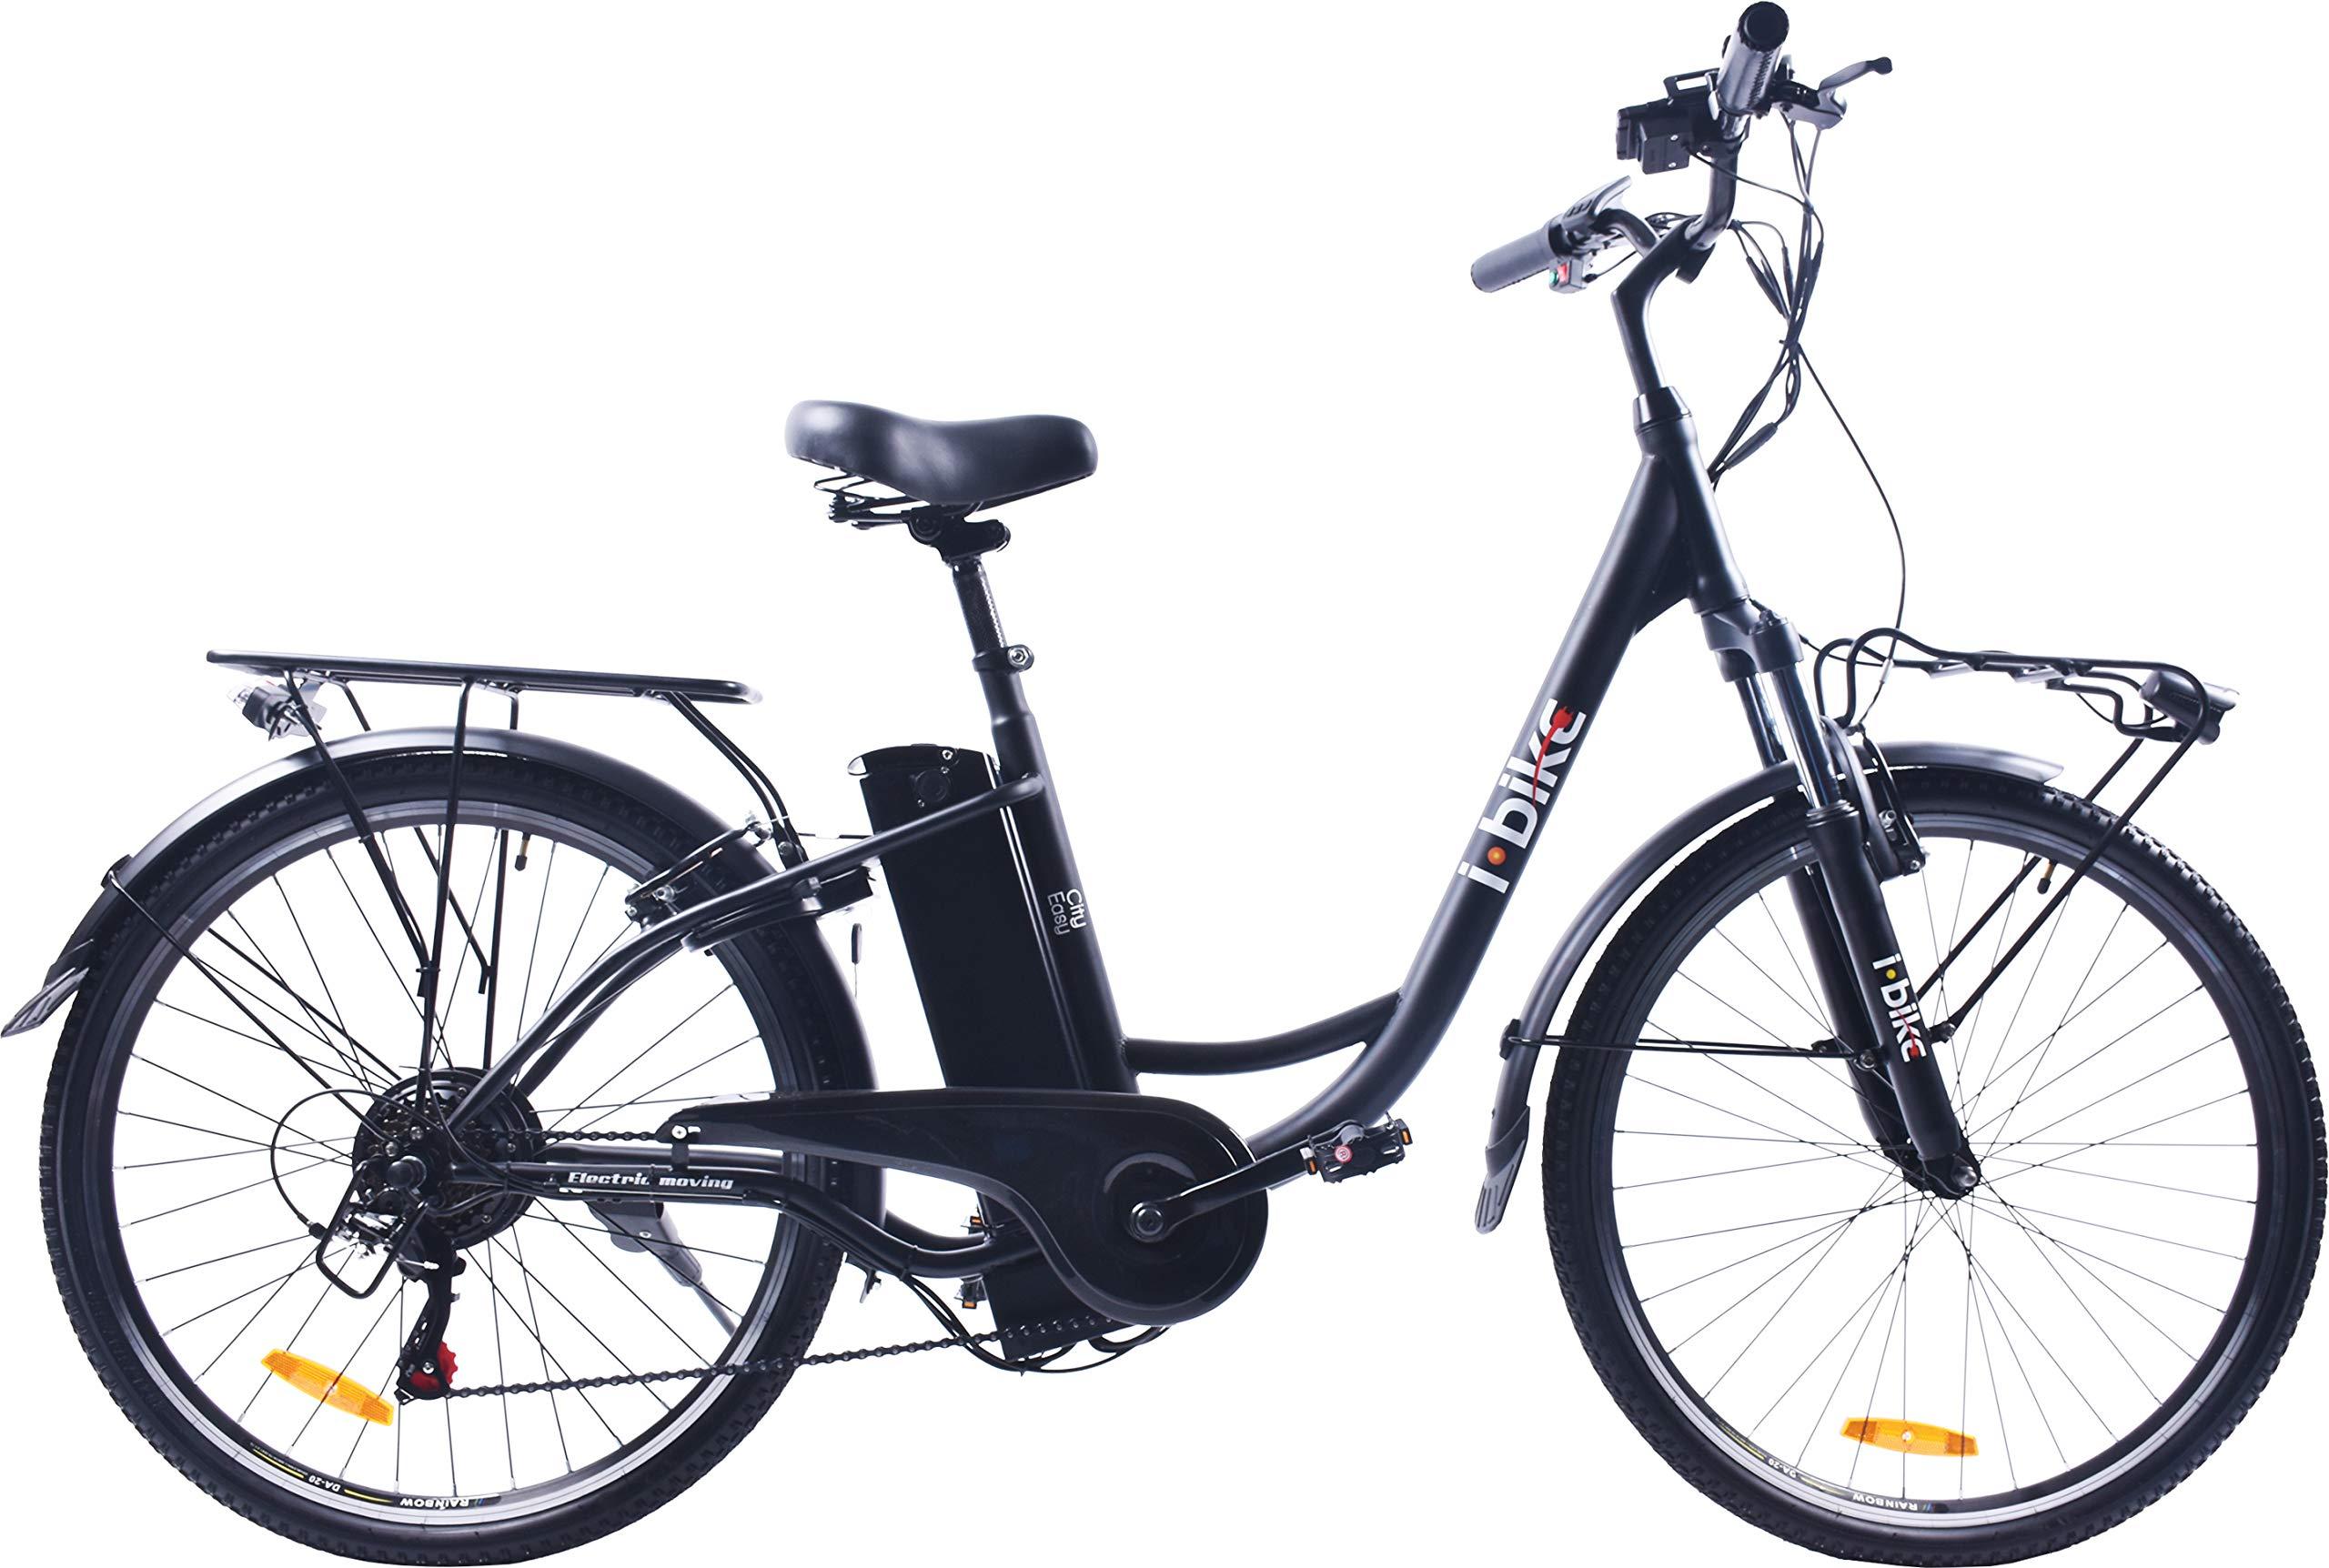 I Bike City Easy Bicicletta Elettrica Unisex Adulto Nero 180 X